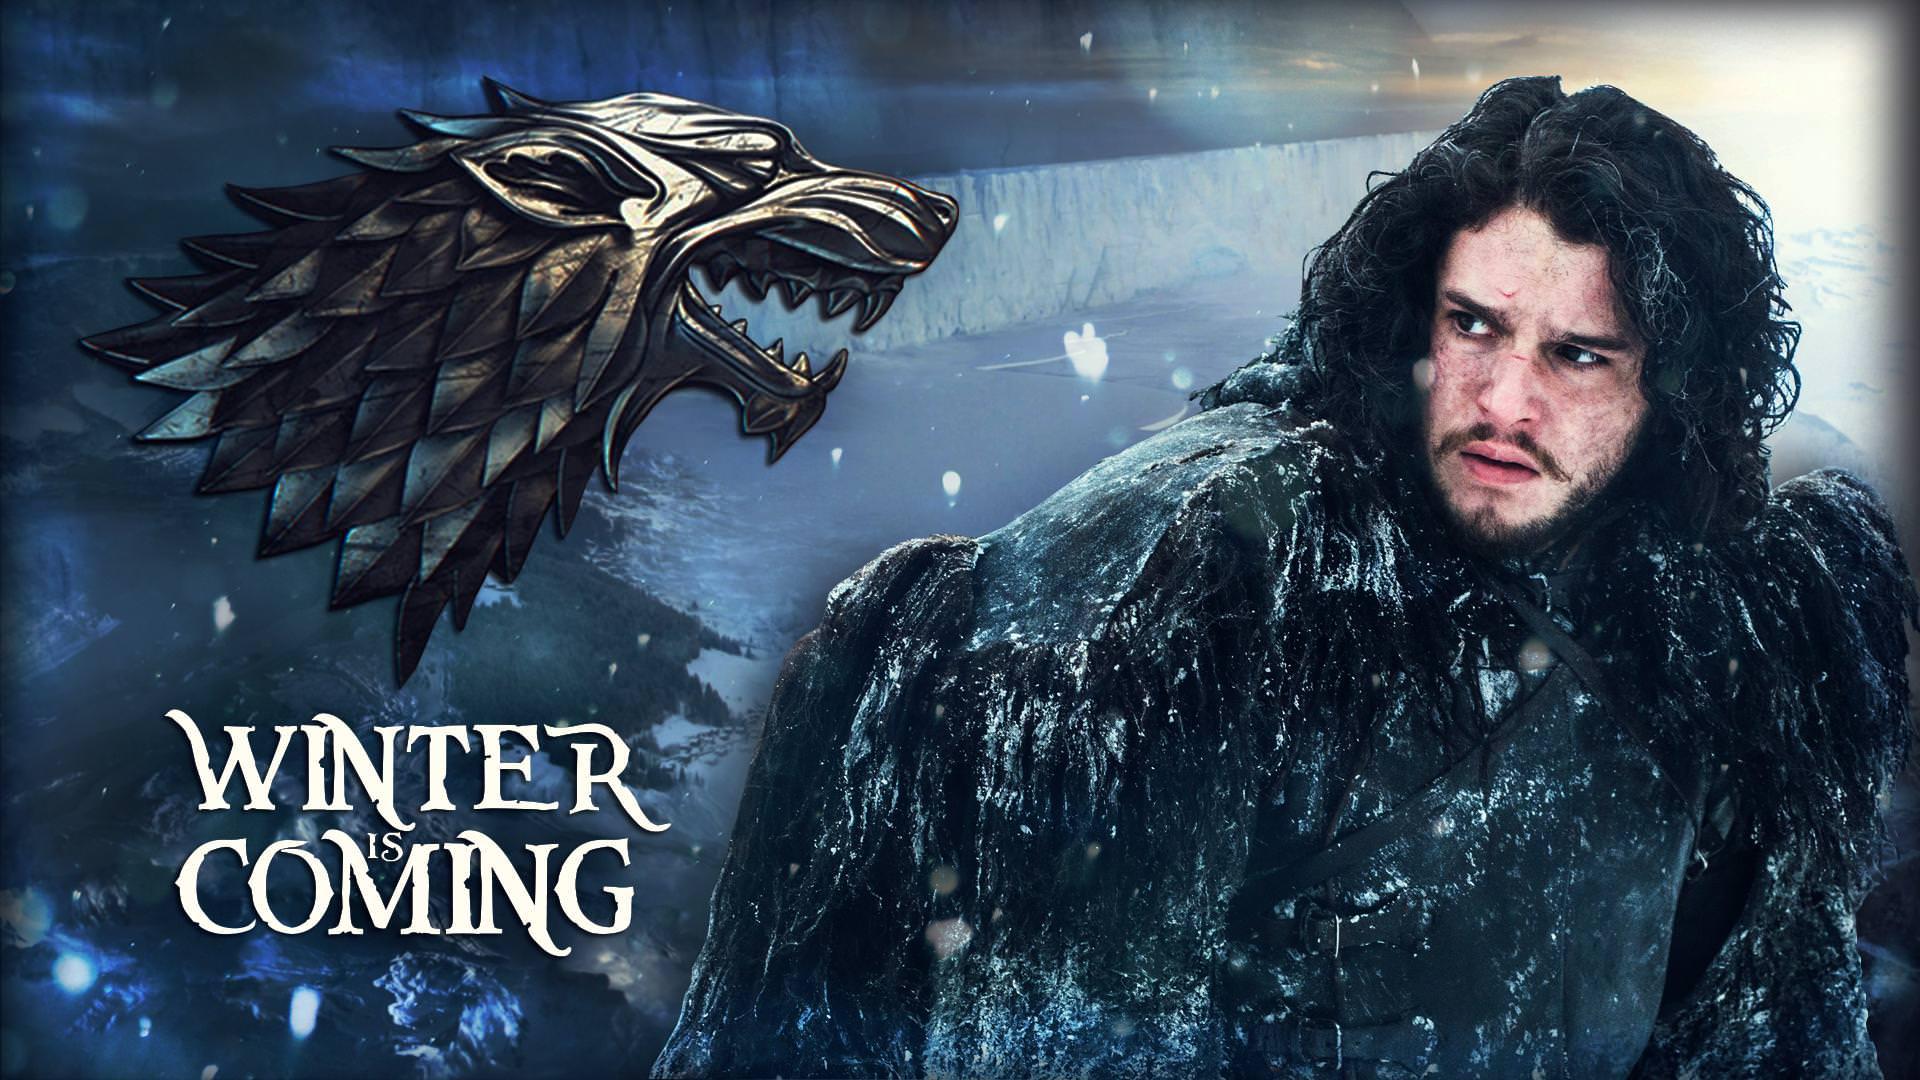 game of thrones desktop background, dragon wallpaper 4k